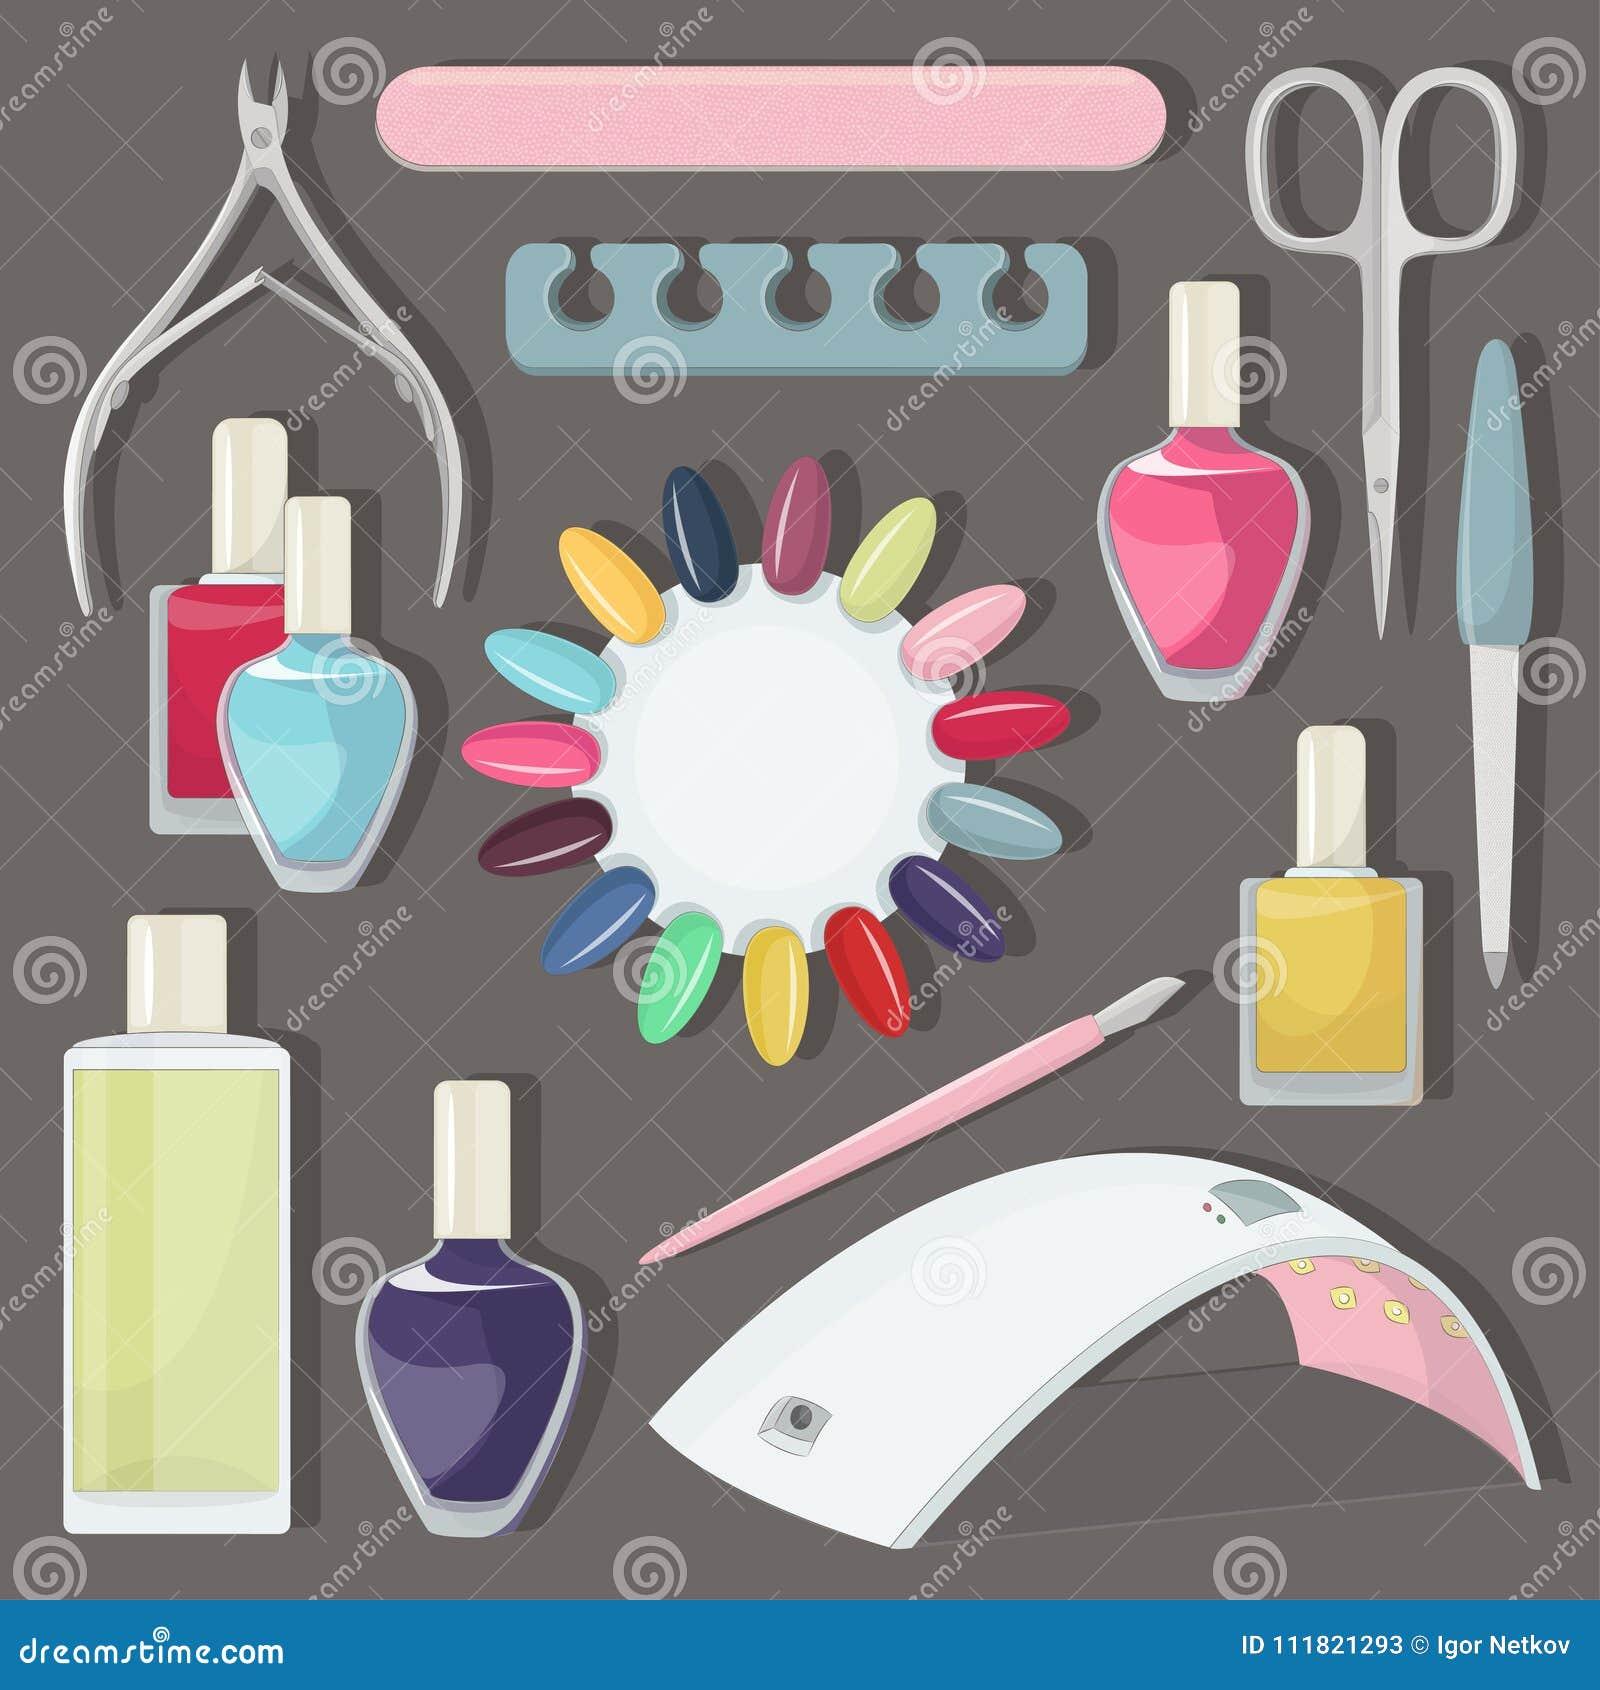 Nail salon set stock vector. Illustration of background - 111821293